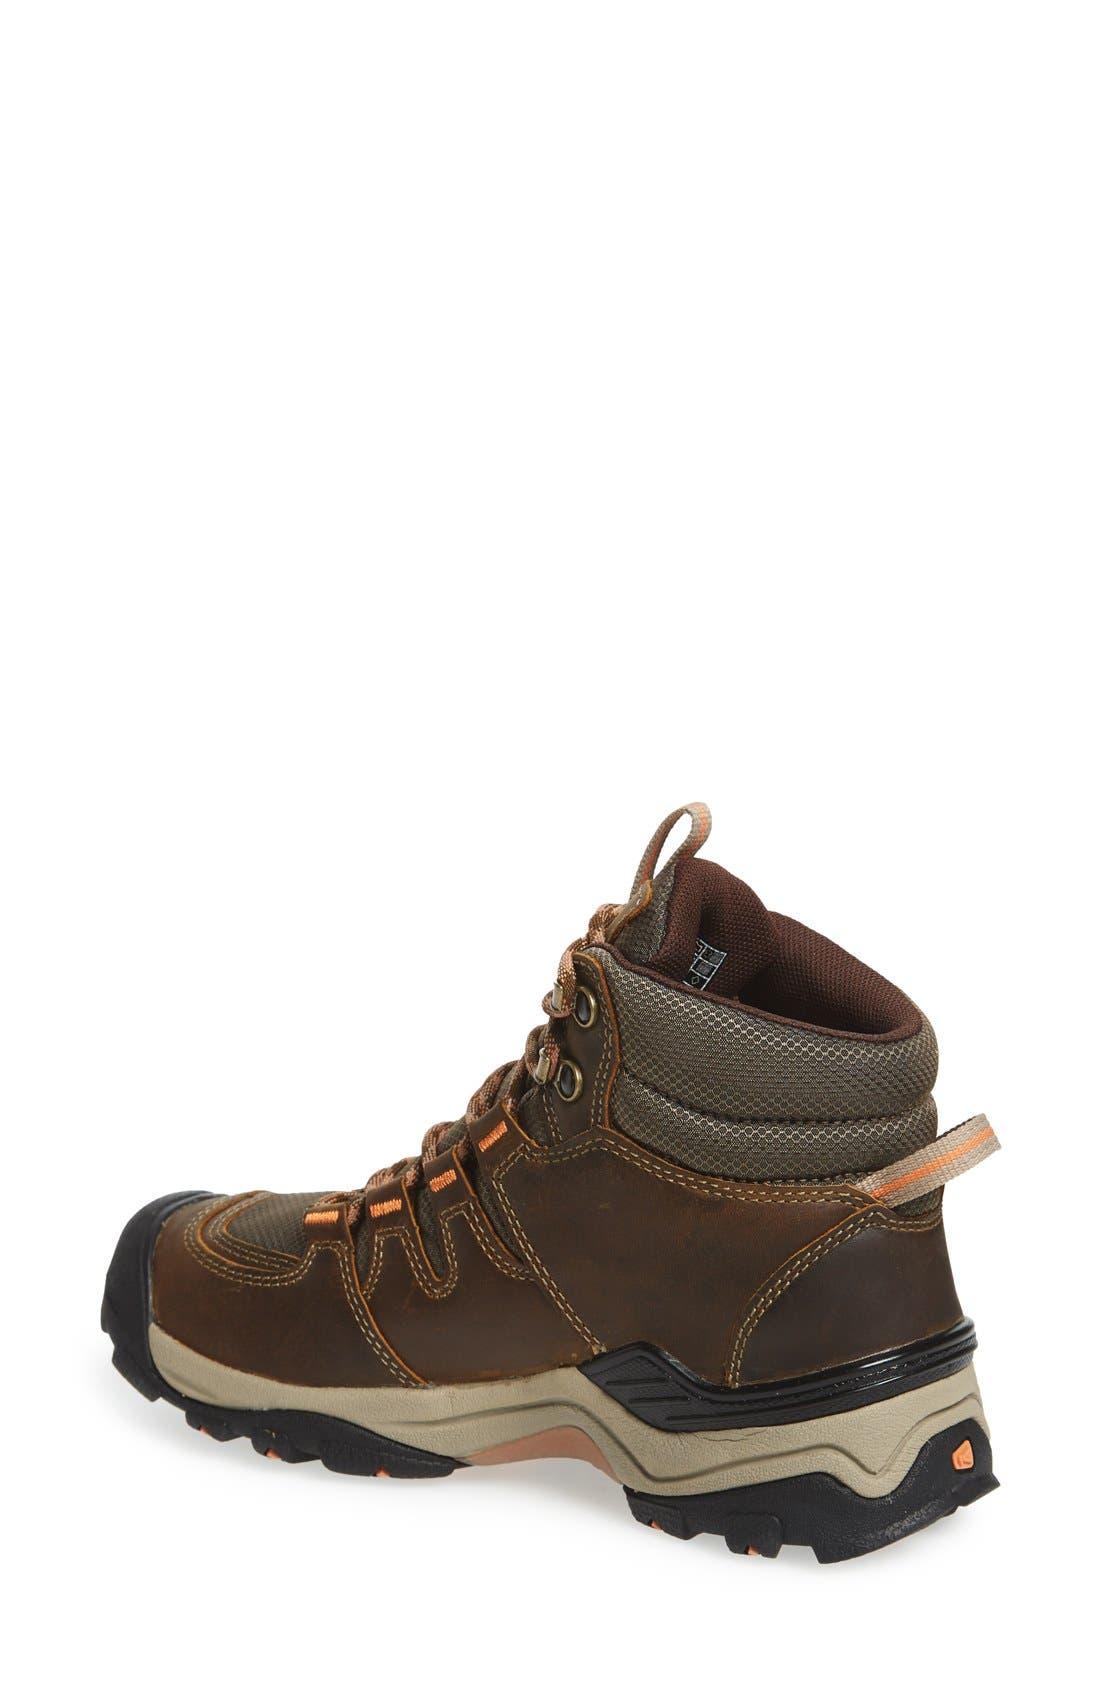 Gypsum II Mid Waterproof Hiking Boot,                             Alternate thumbnail 2, color,                             CORNSTOCK/ GOLD CORAL